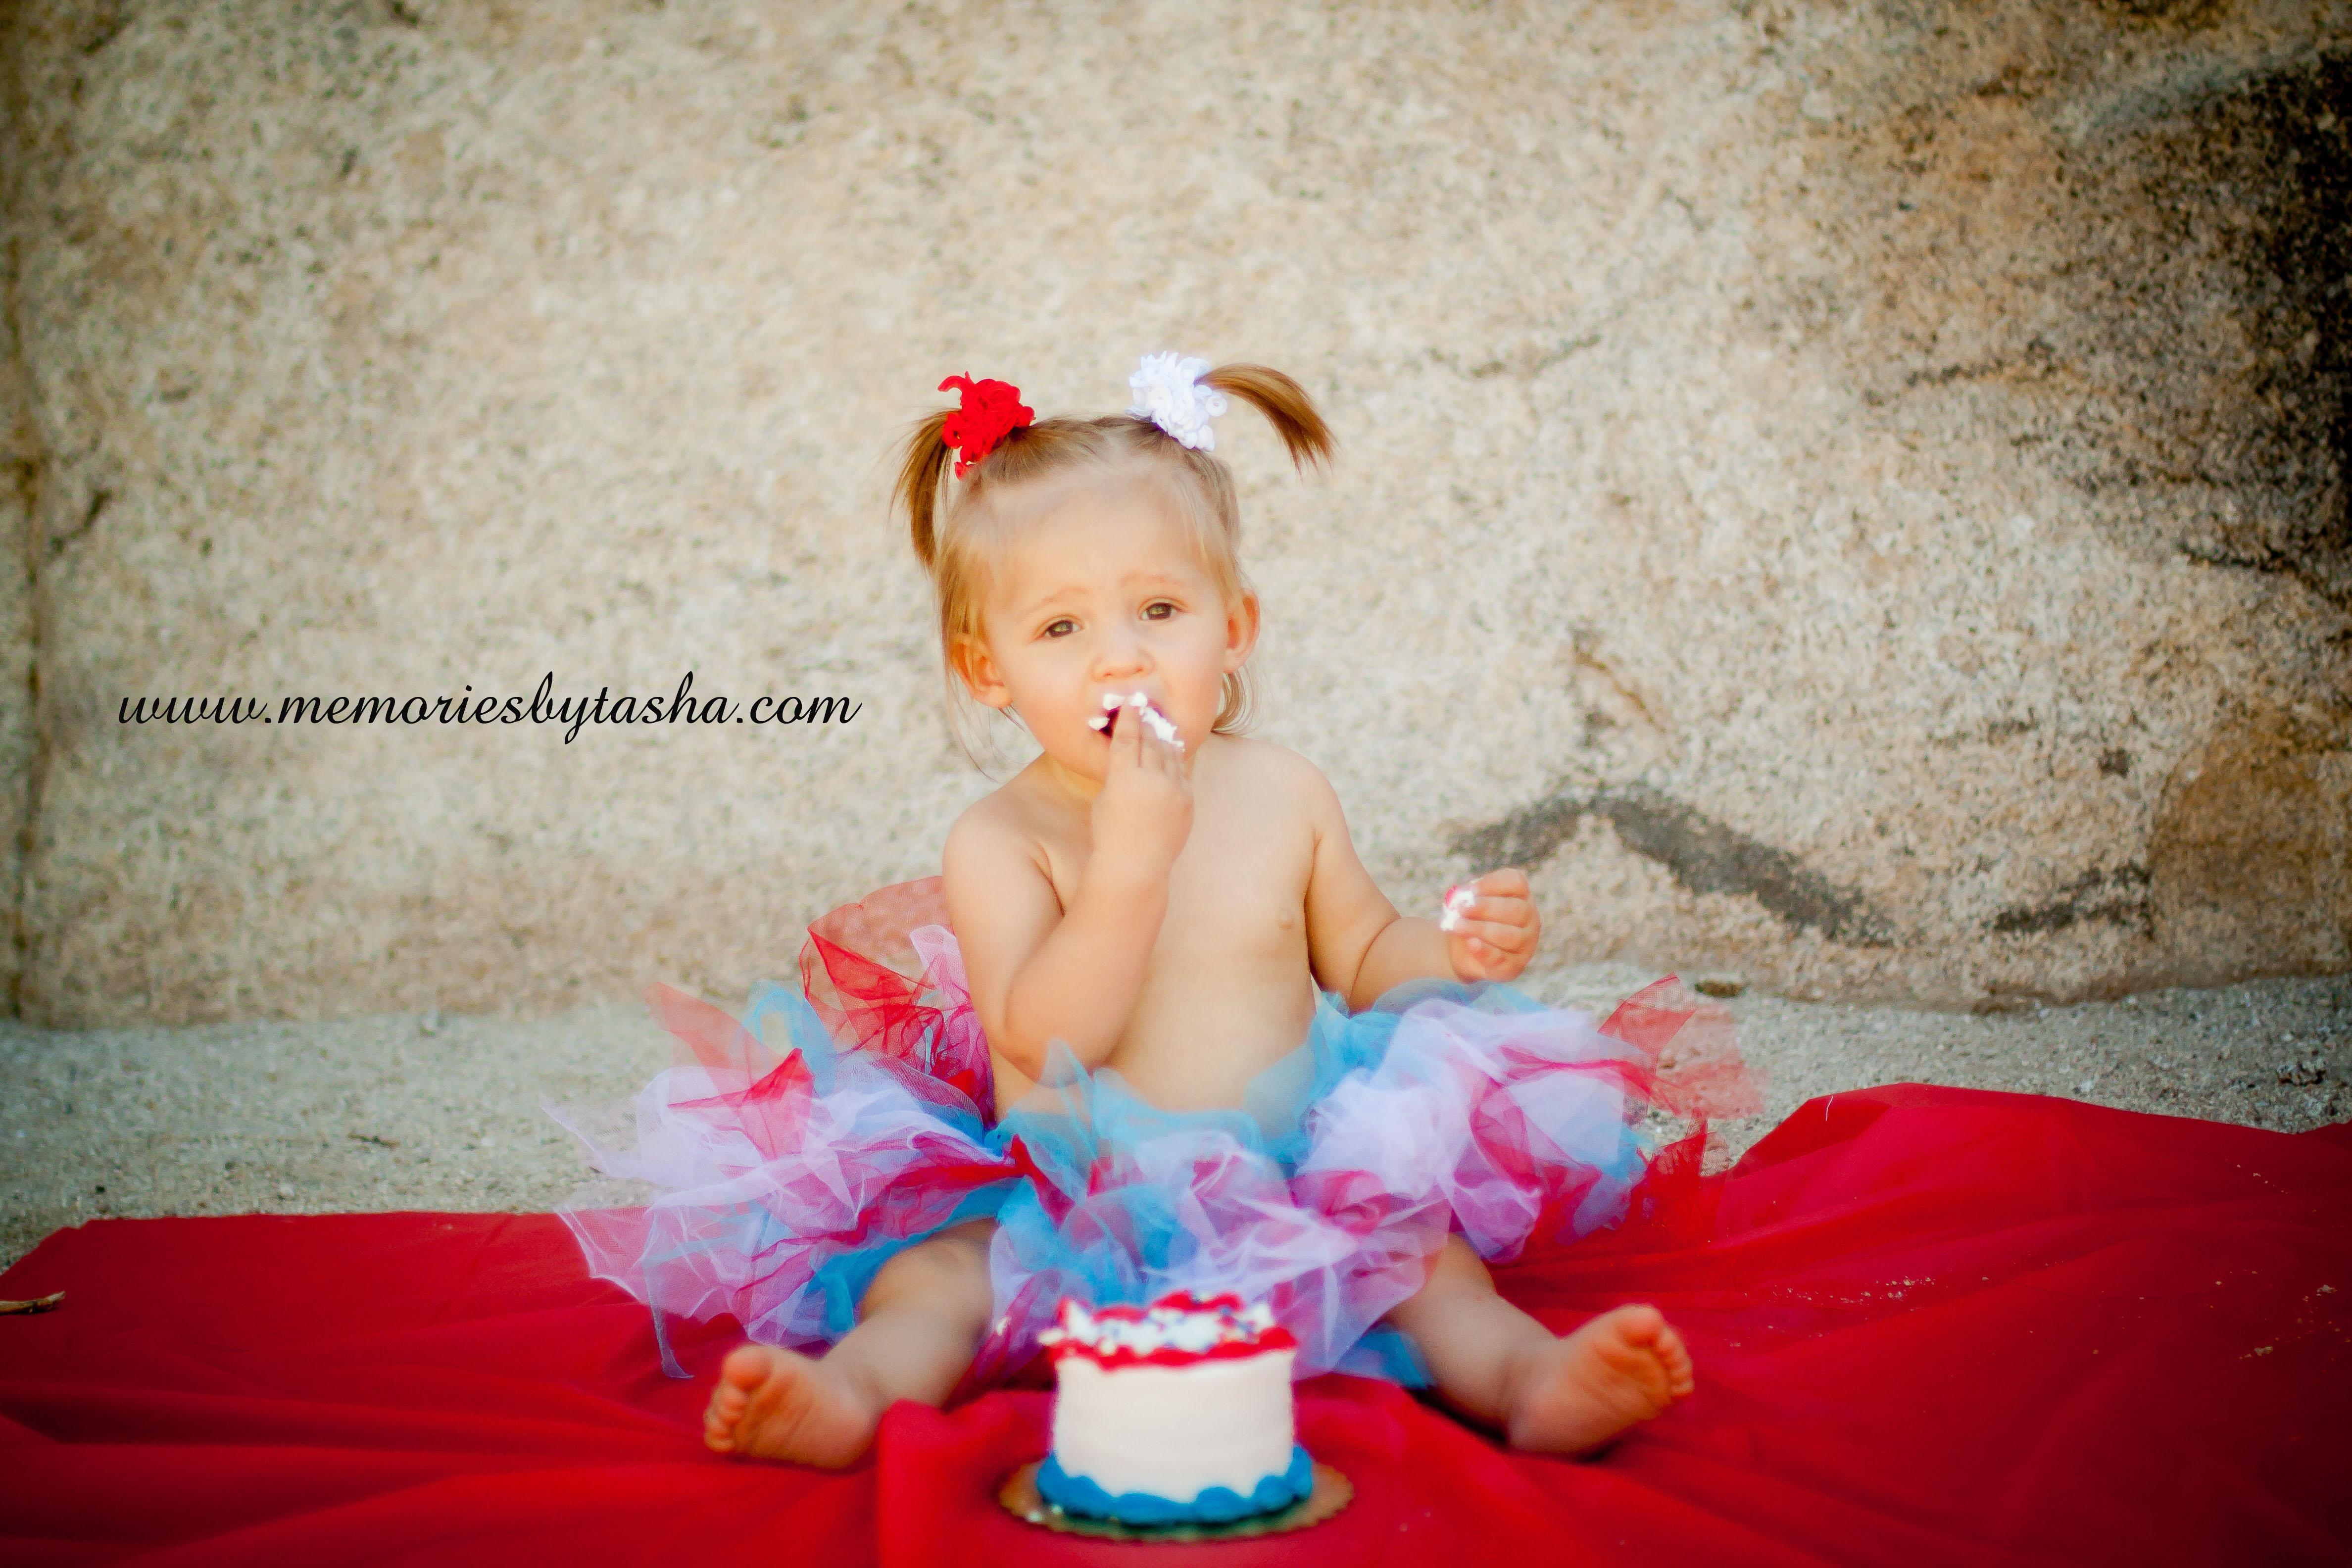 Twentynine Palms Photographer - Couples Photography - Family Photography - Children's Photography - Cake Smash-012